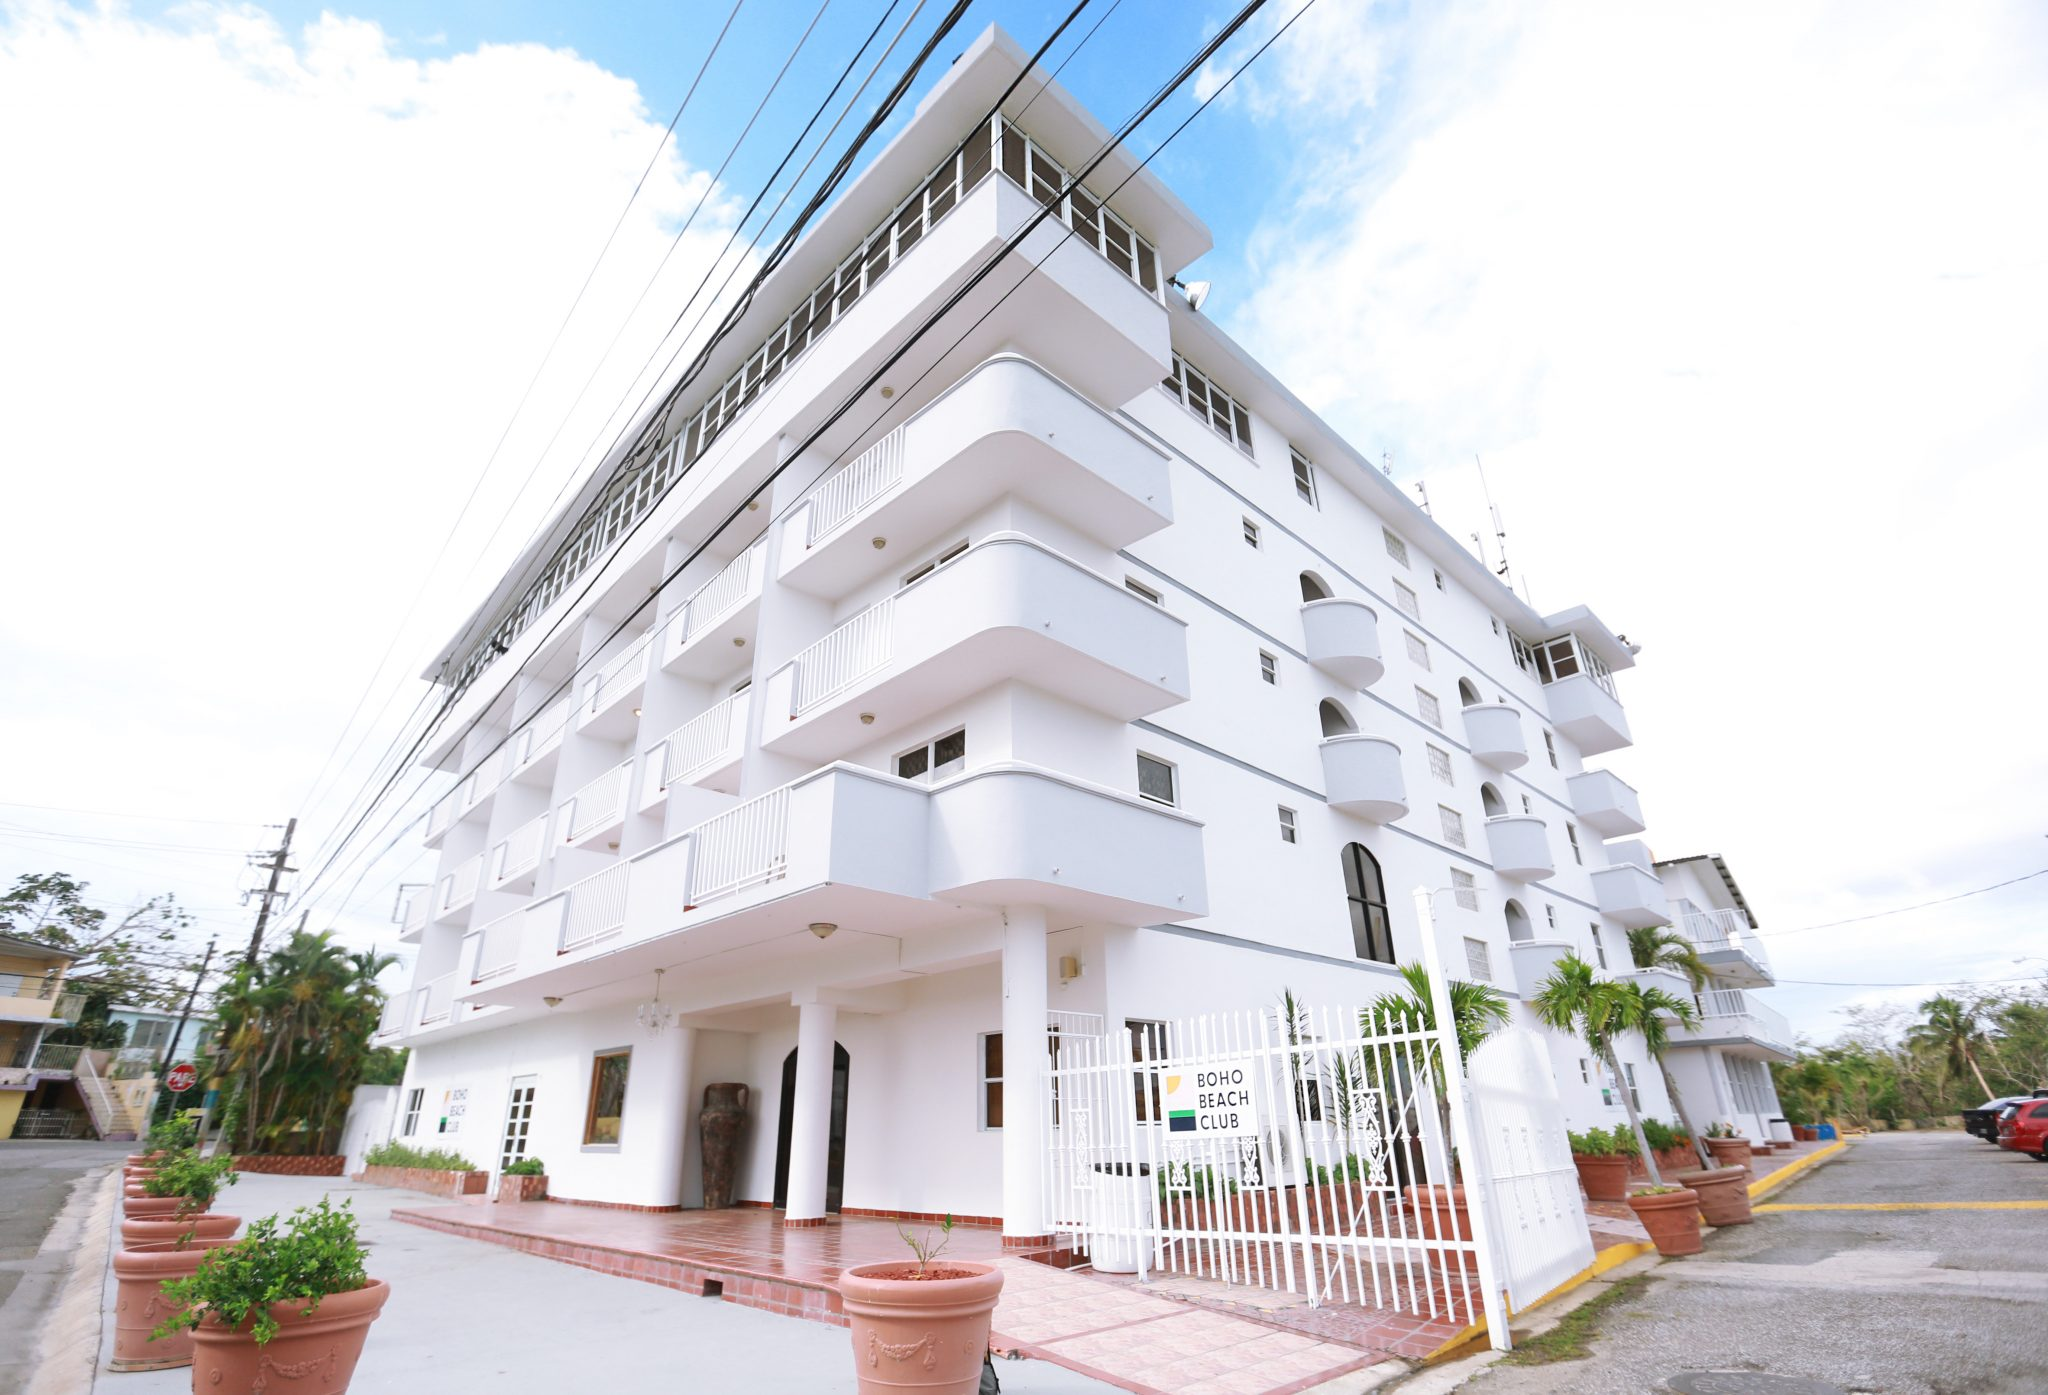 5daa266645 Boho Beach Club - Your Home away from home | Puerto Rico